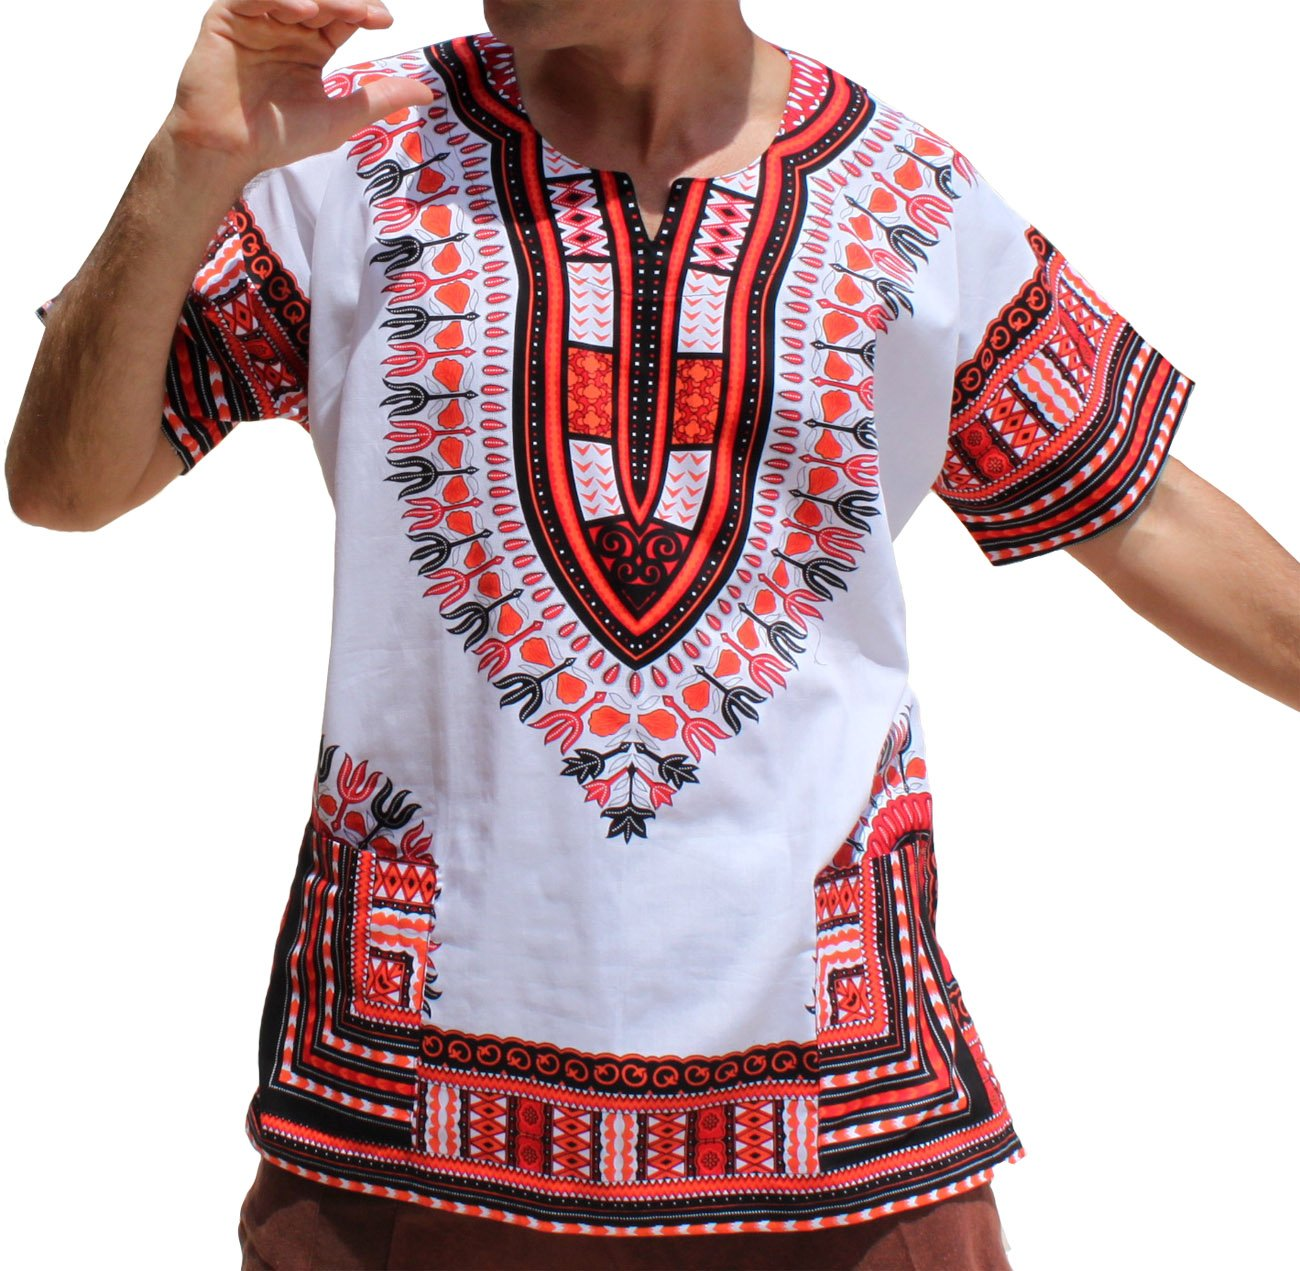 RaanPahMuang Brand Unisex Bright African White Dashiki Cotton Shirt #42 Light Red Small